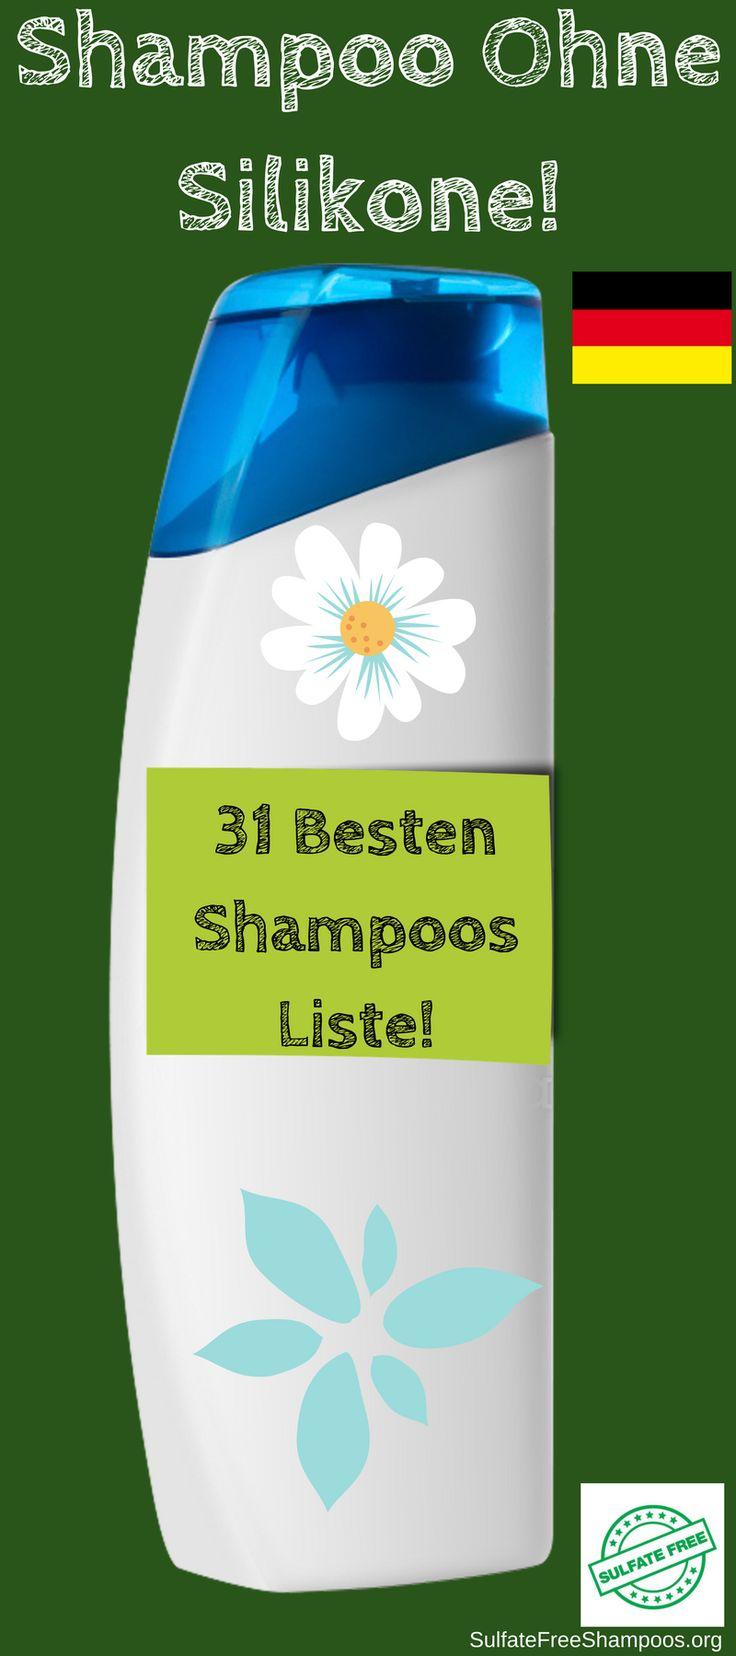 Shampoo ohne silikone. 31 besten shampoos liste.